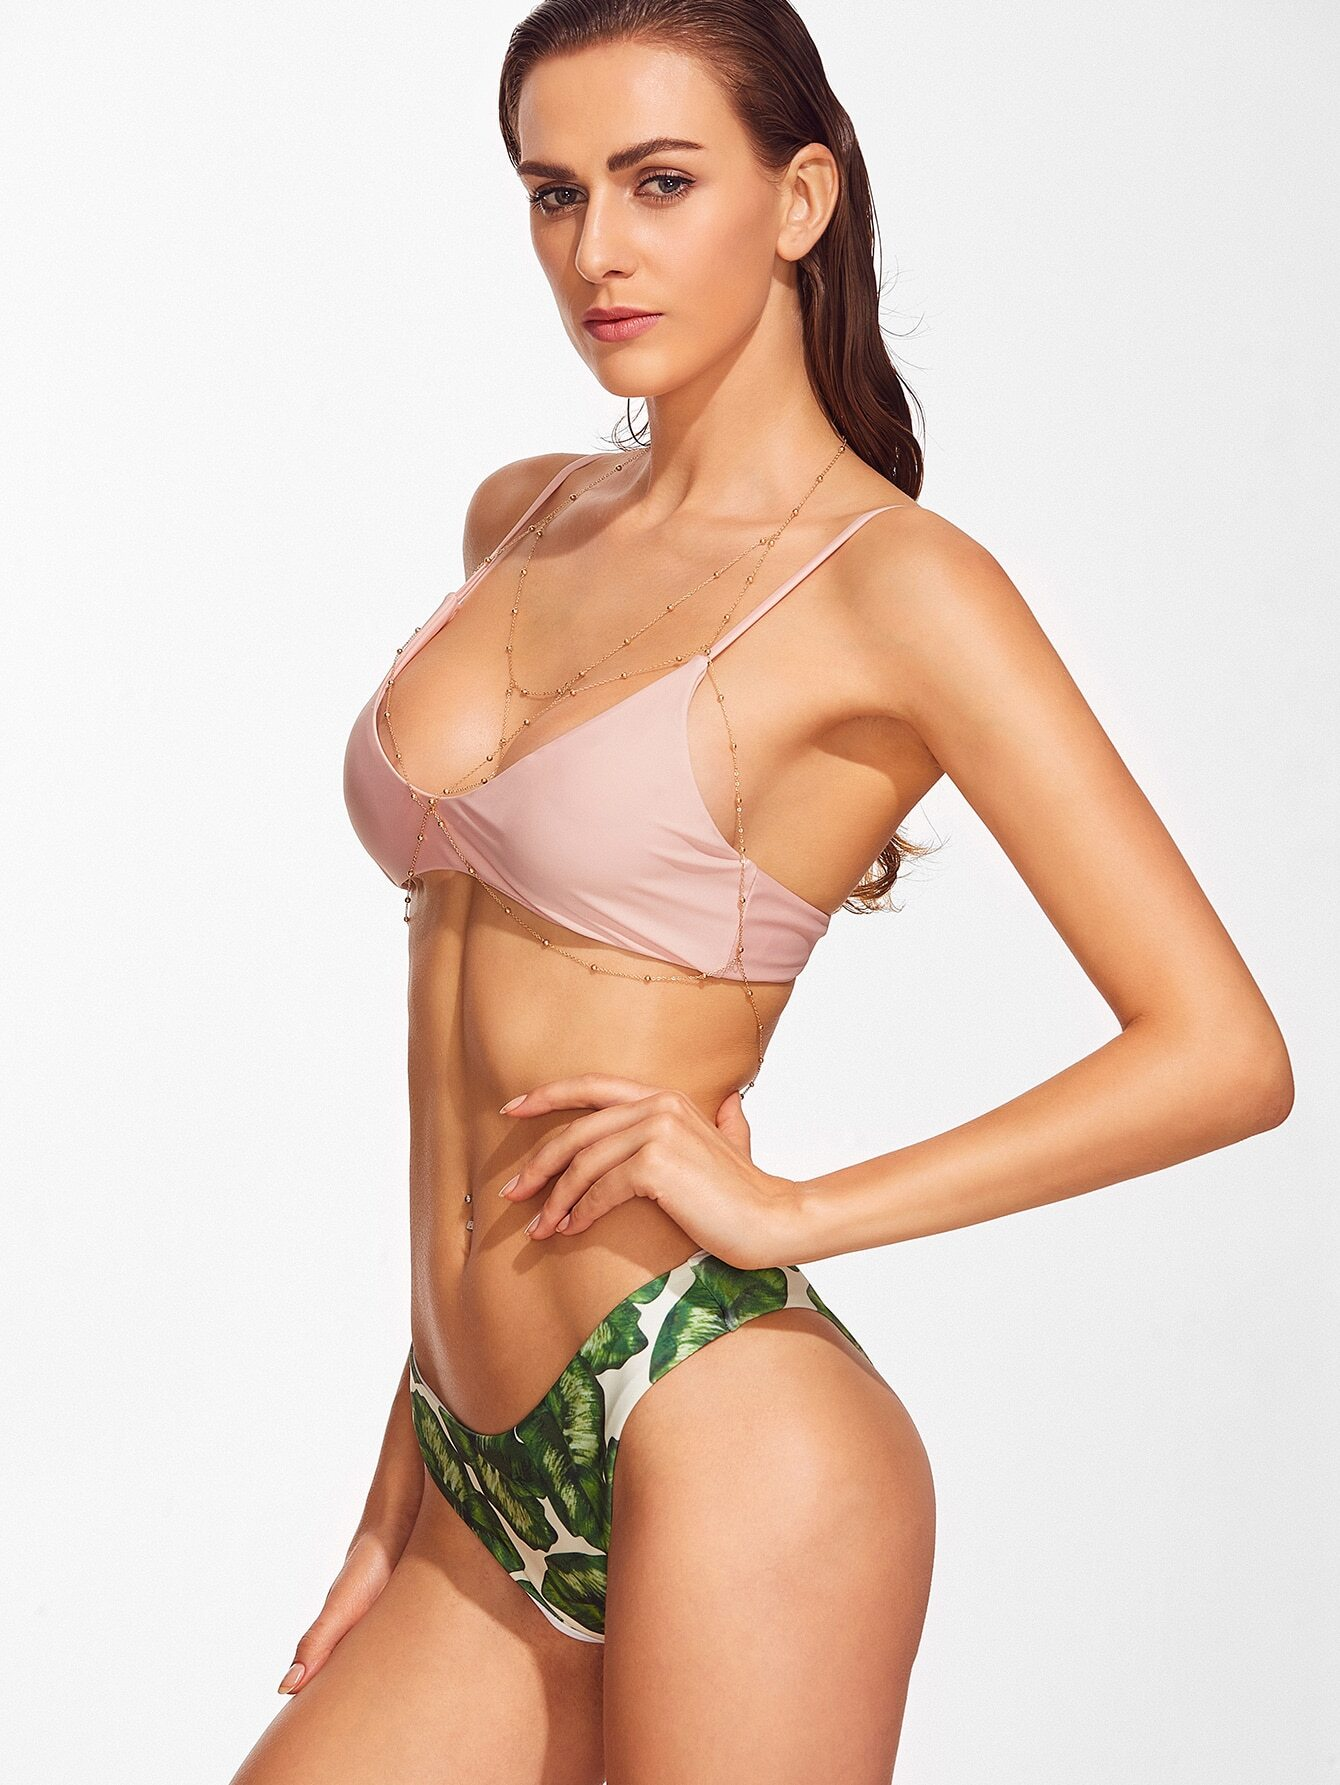 what-is-the-sexiest-bikini